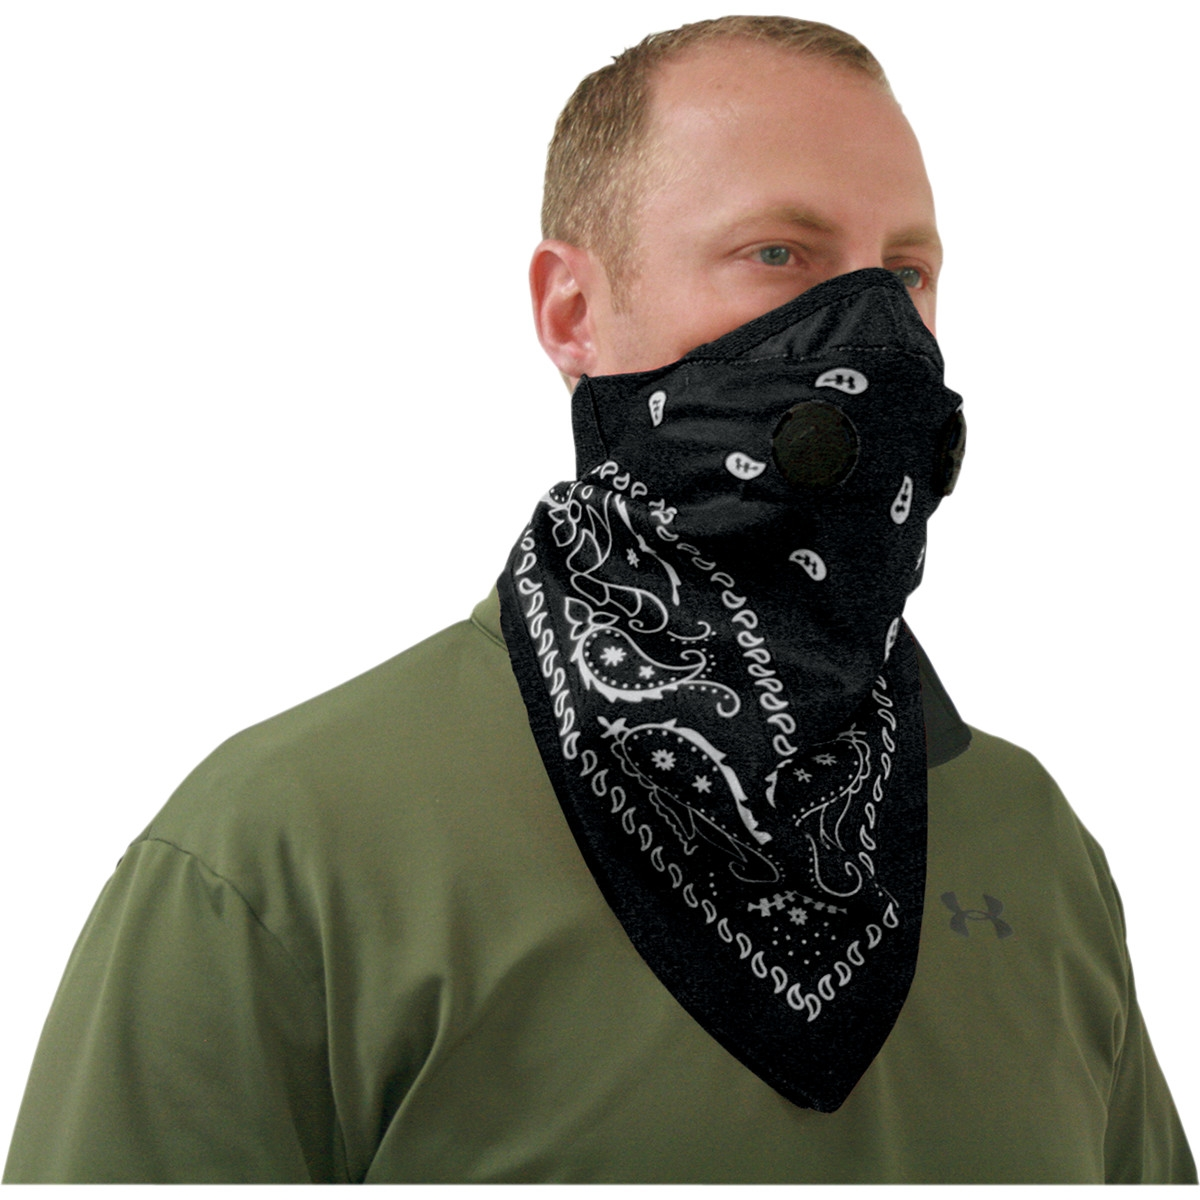 Mascherine antismog stile bandana motivo black paisley Pro Series